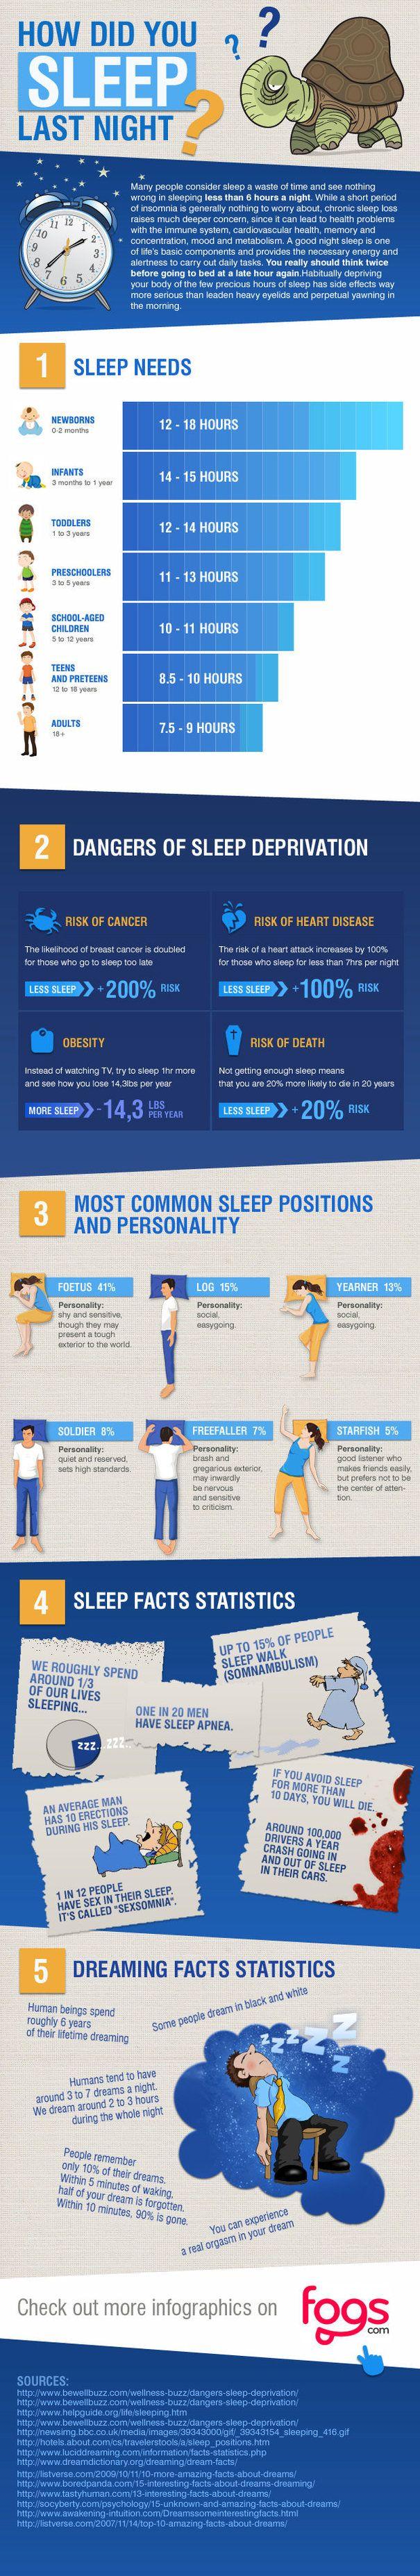 Cuánto necesitar dormir #infograia #infographic #health